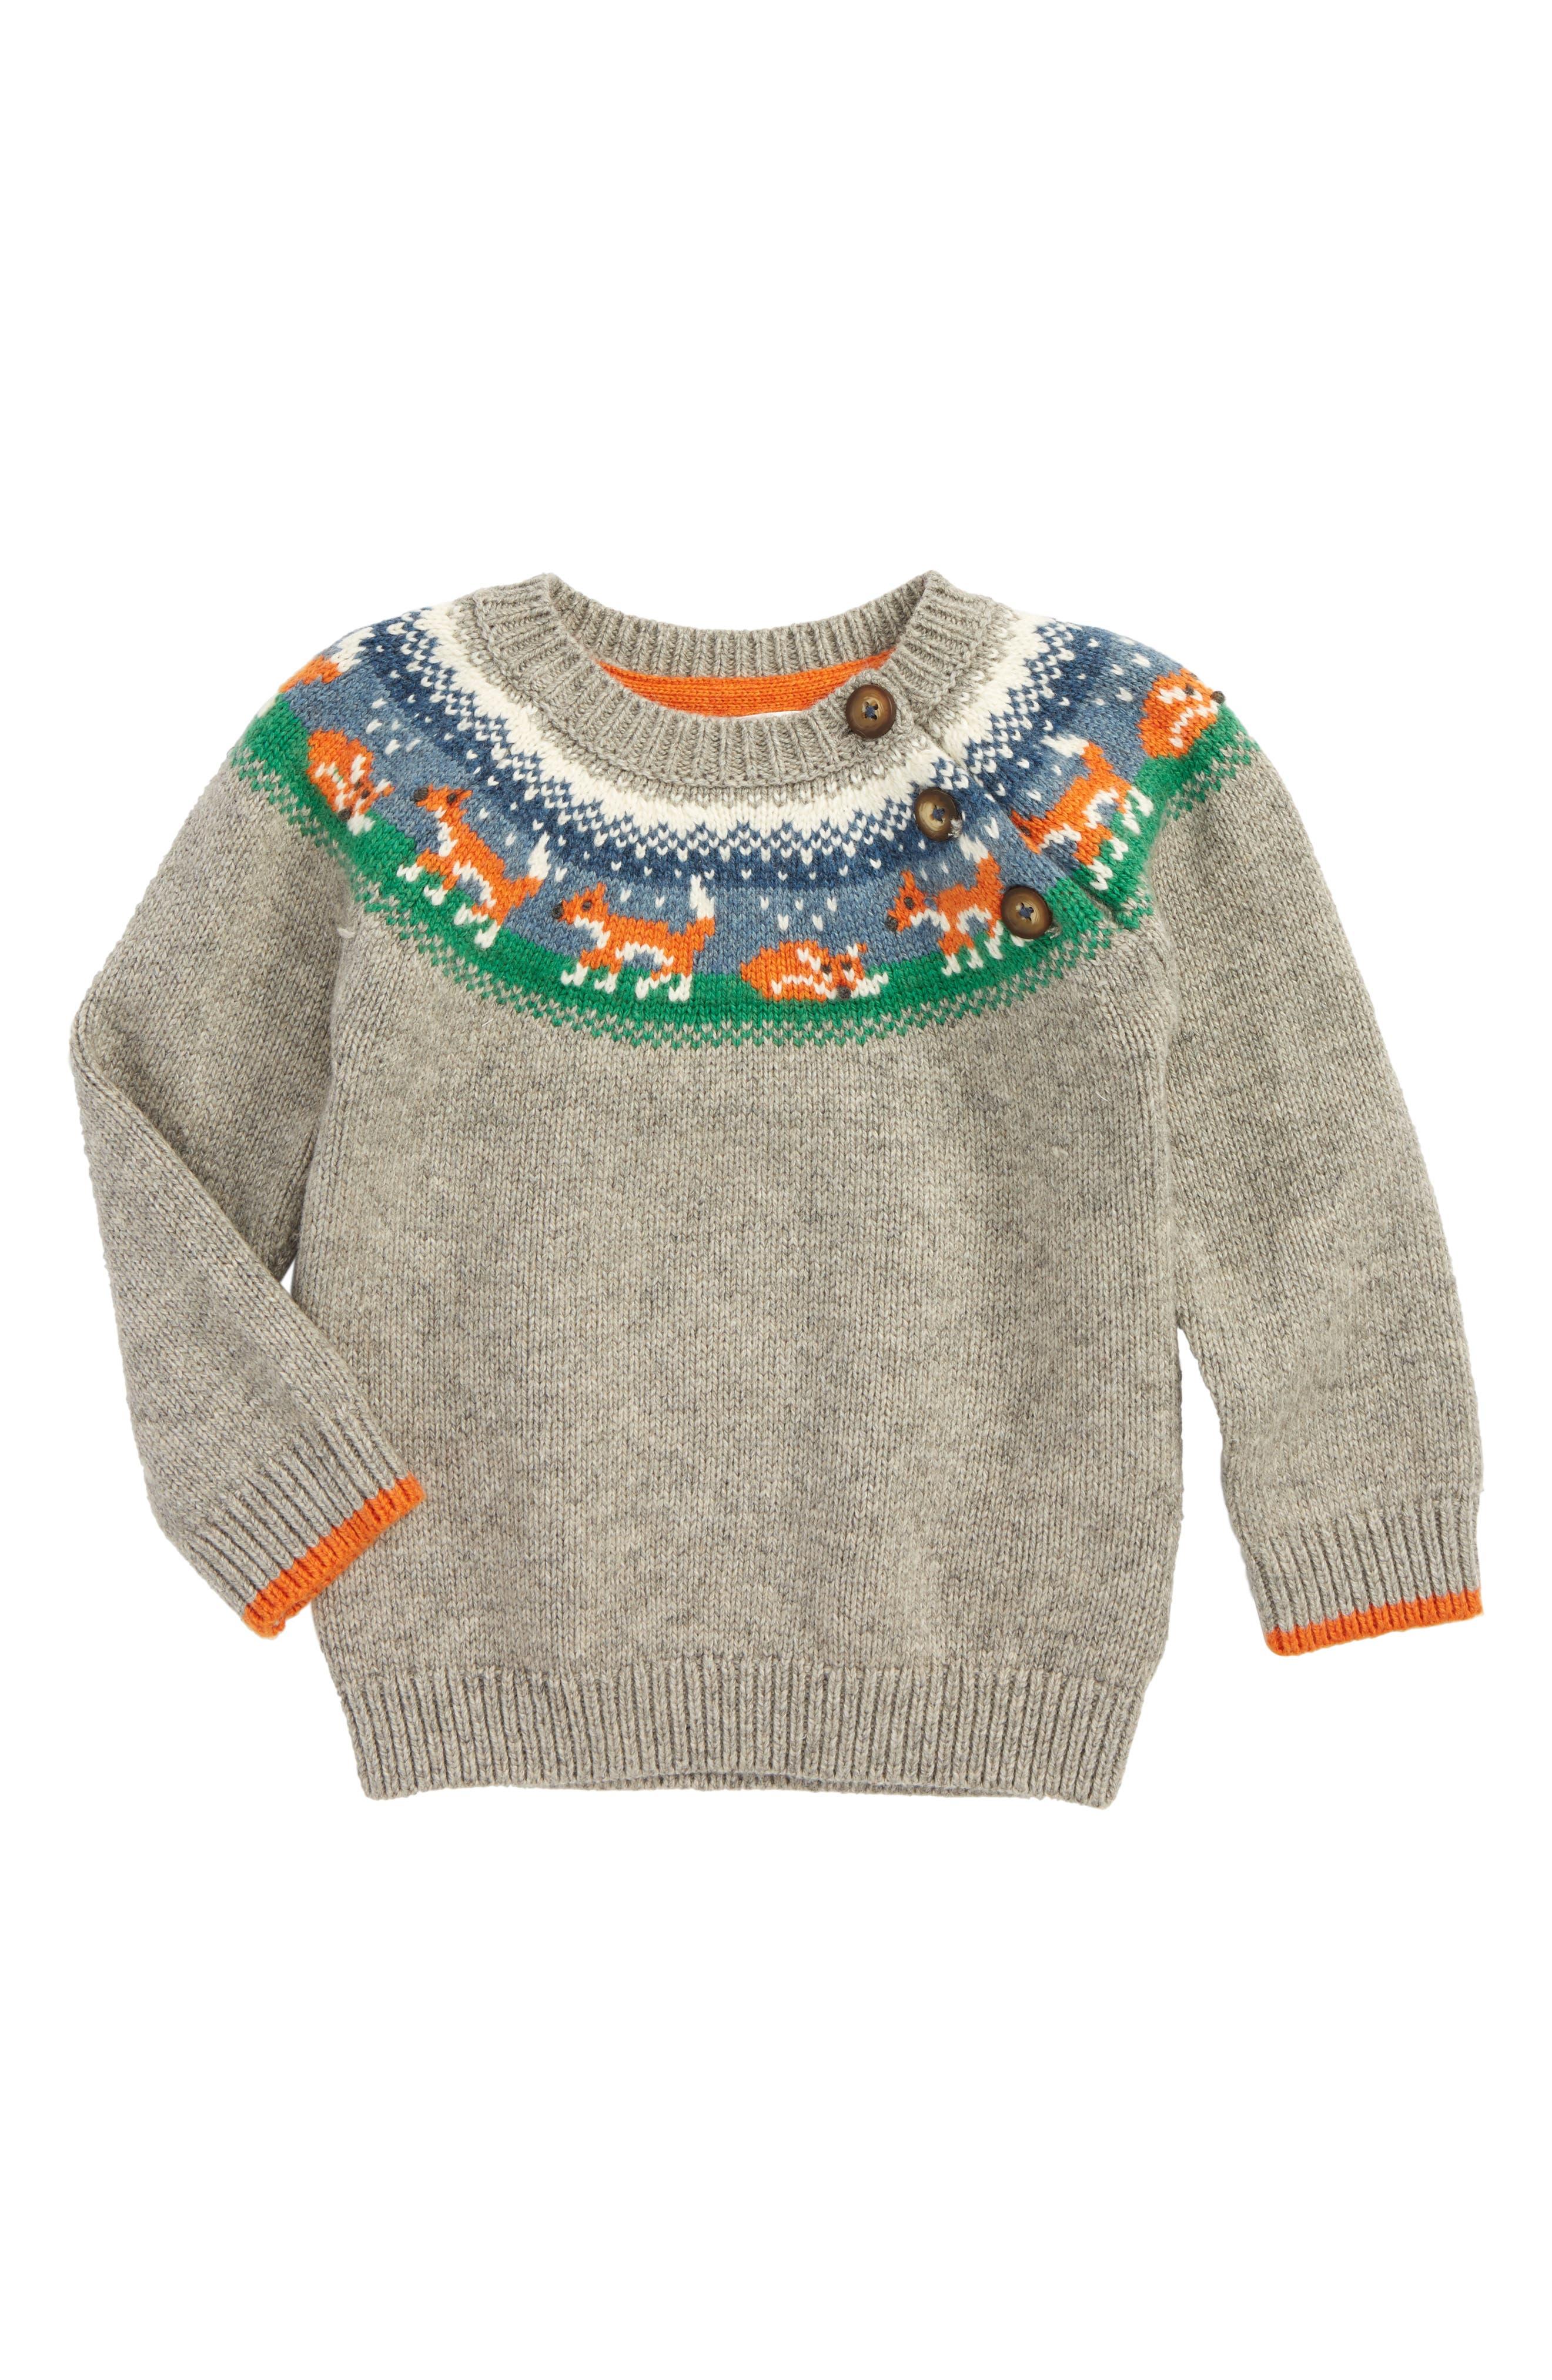 Main Image - Mini Boden Fair Isle Sweater (Baby Boys & Toddler Boys)